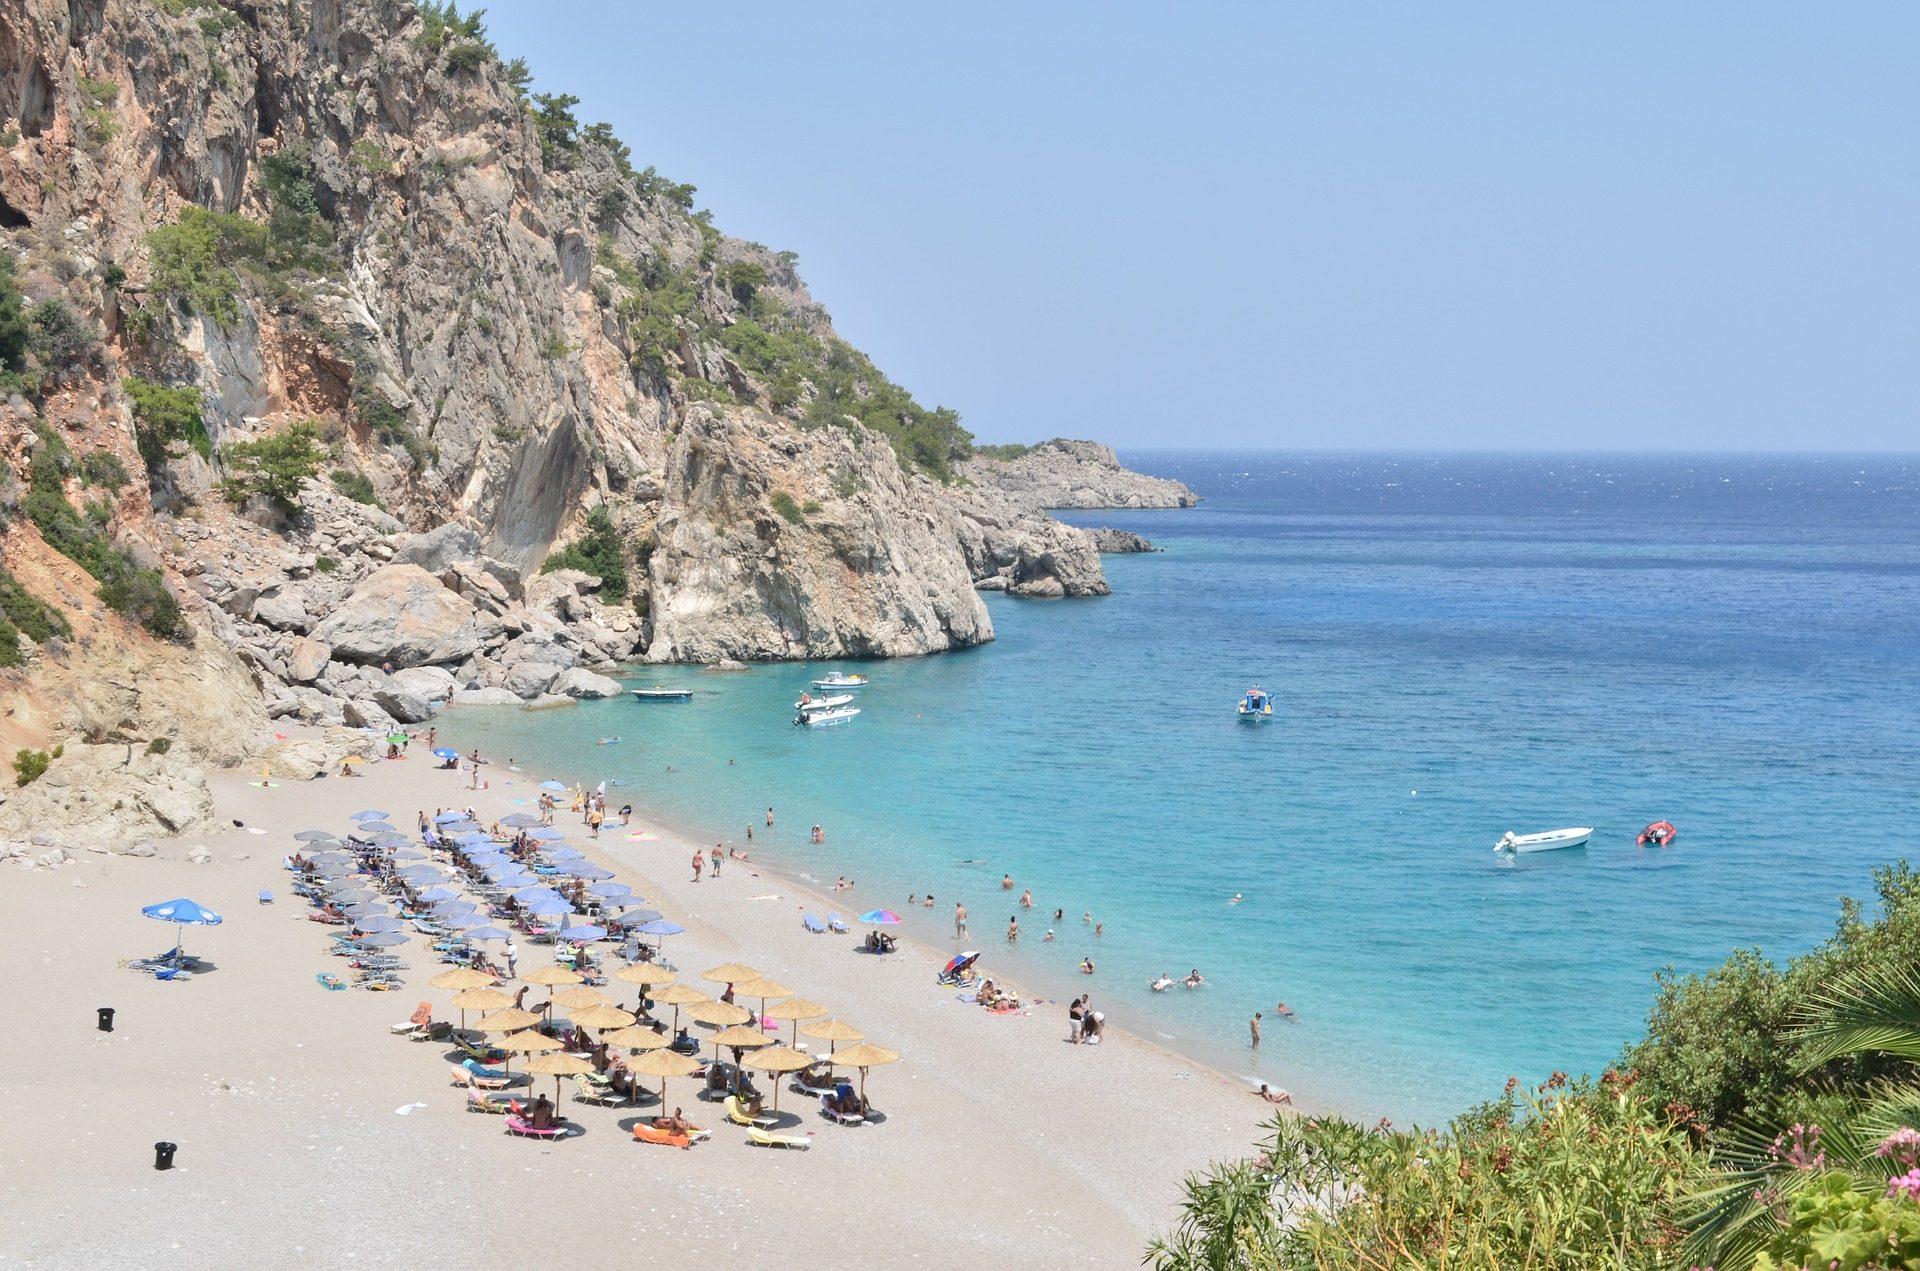 All Inclusive Urlaub Bulgarien - Goldstrand günstiger ab 233,00€